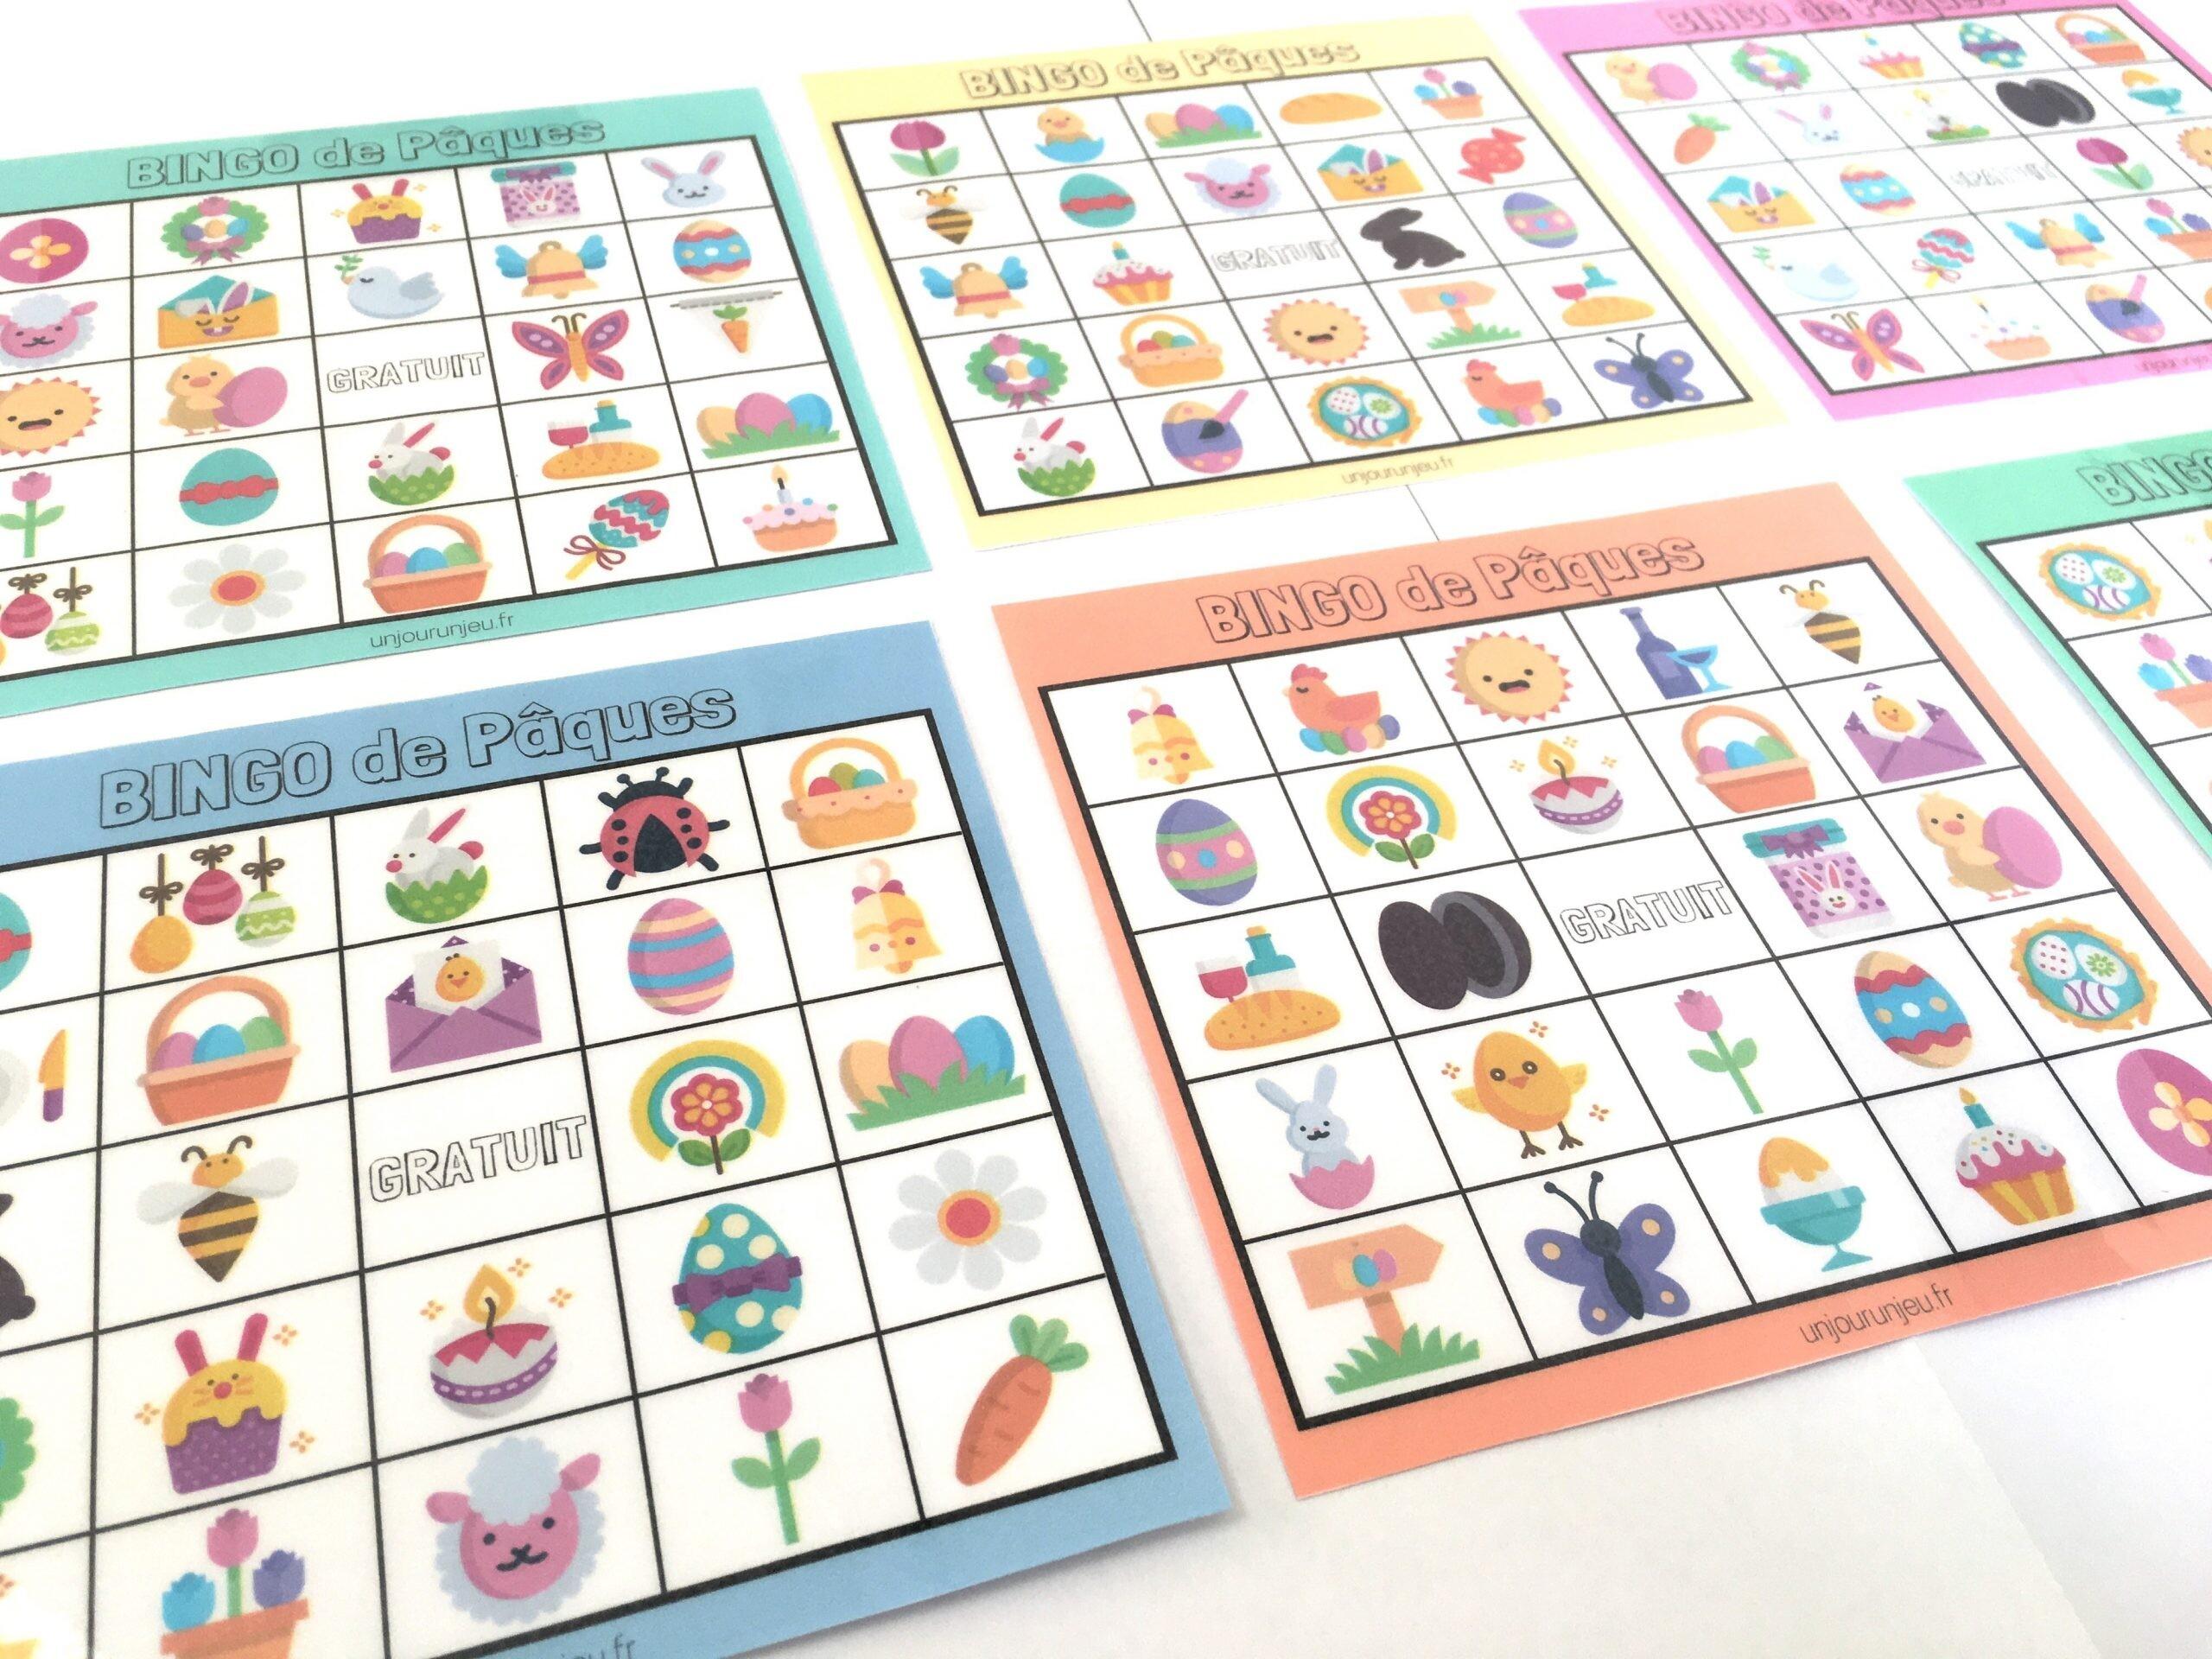 Bingo de pâques à imprimer gratuitement